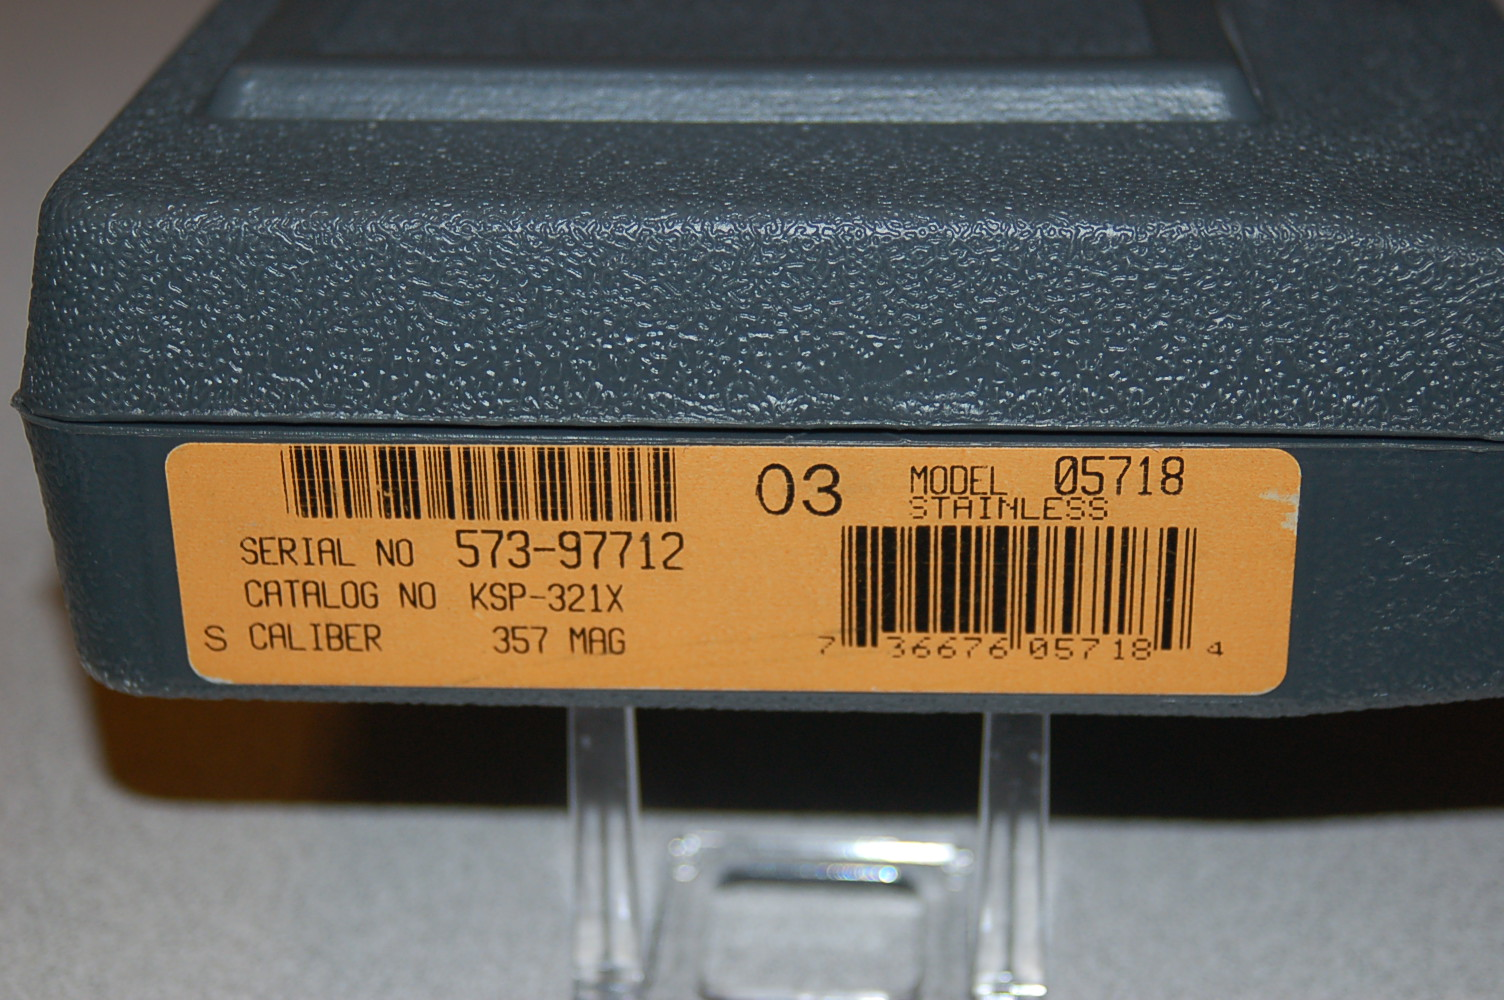 "WTS: Ruger SP101 SS .357 2.25"" CT Laser Grips: [TX]-dsc_2543.jpg"